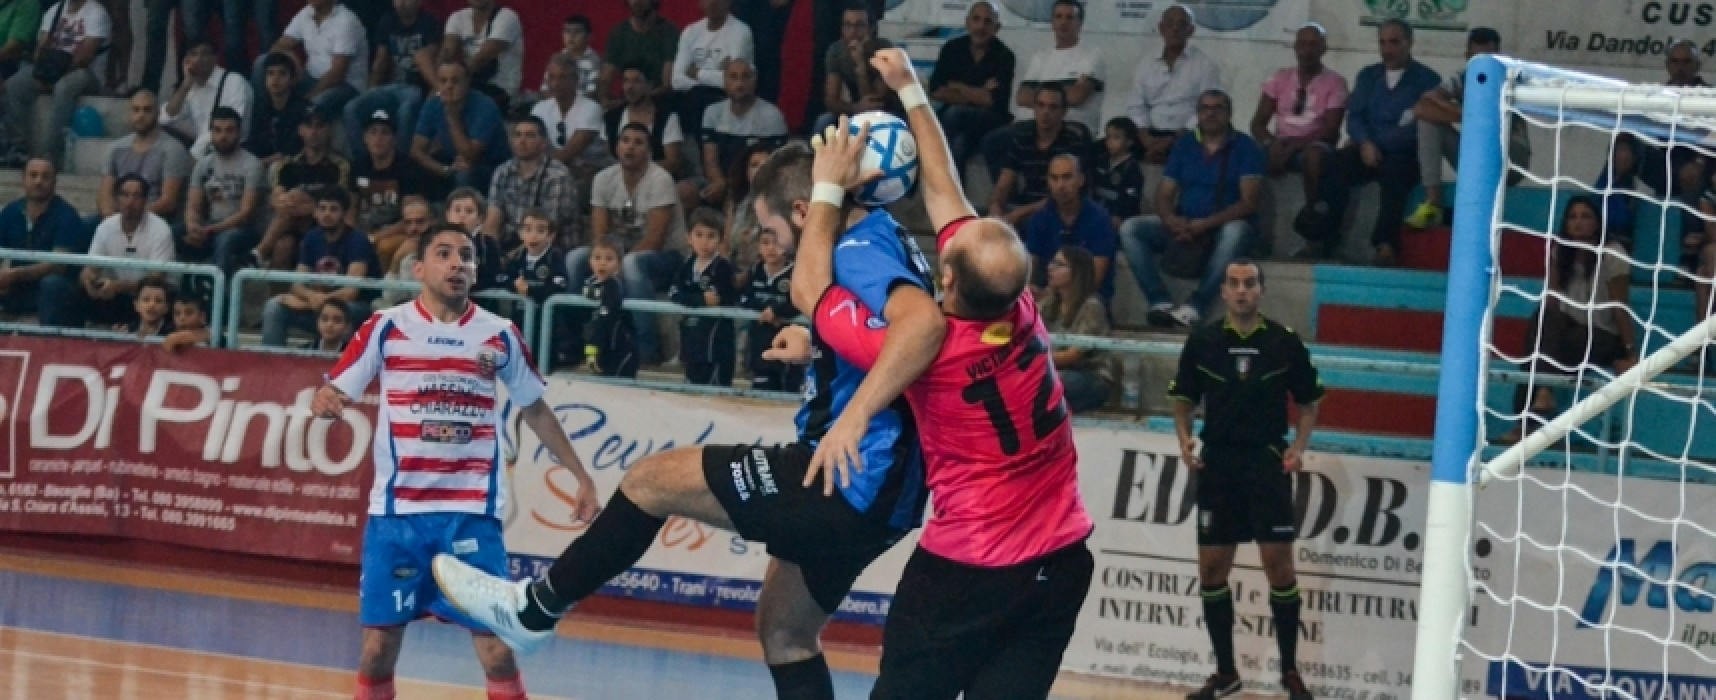 LIVE: Giovinazzo – Futsal Bisceglie 1-6